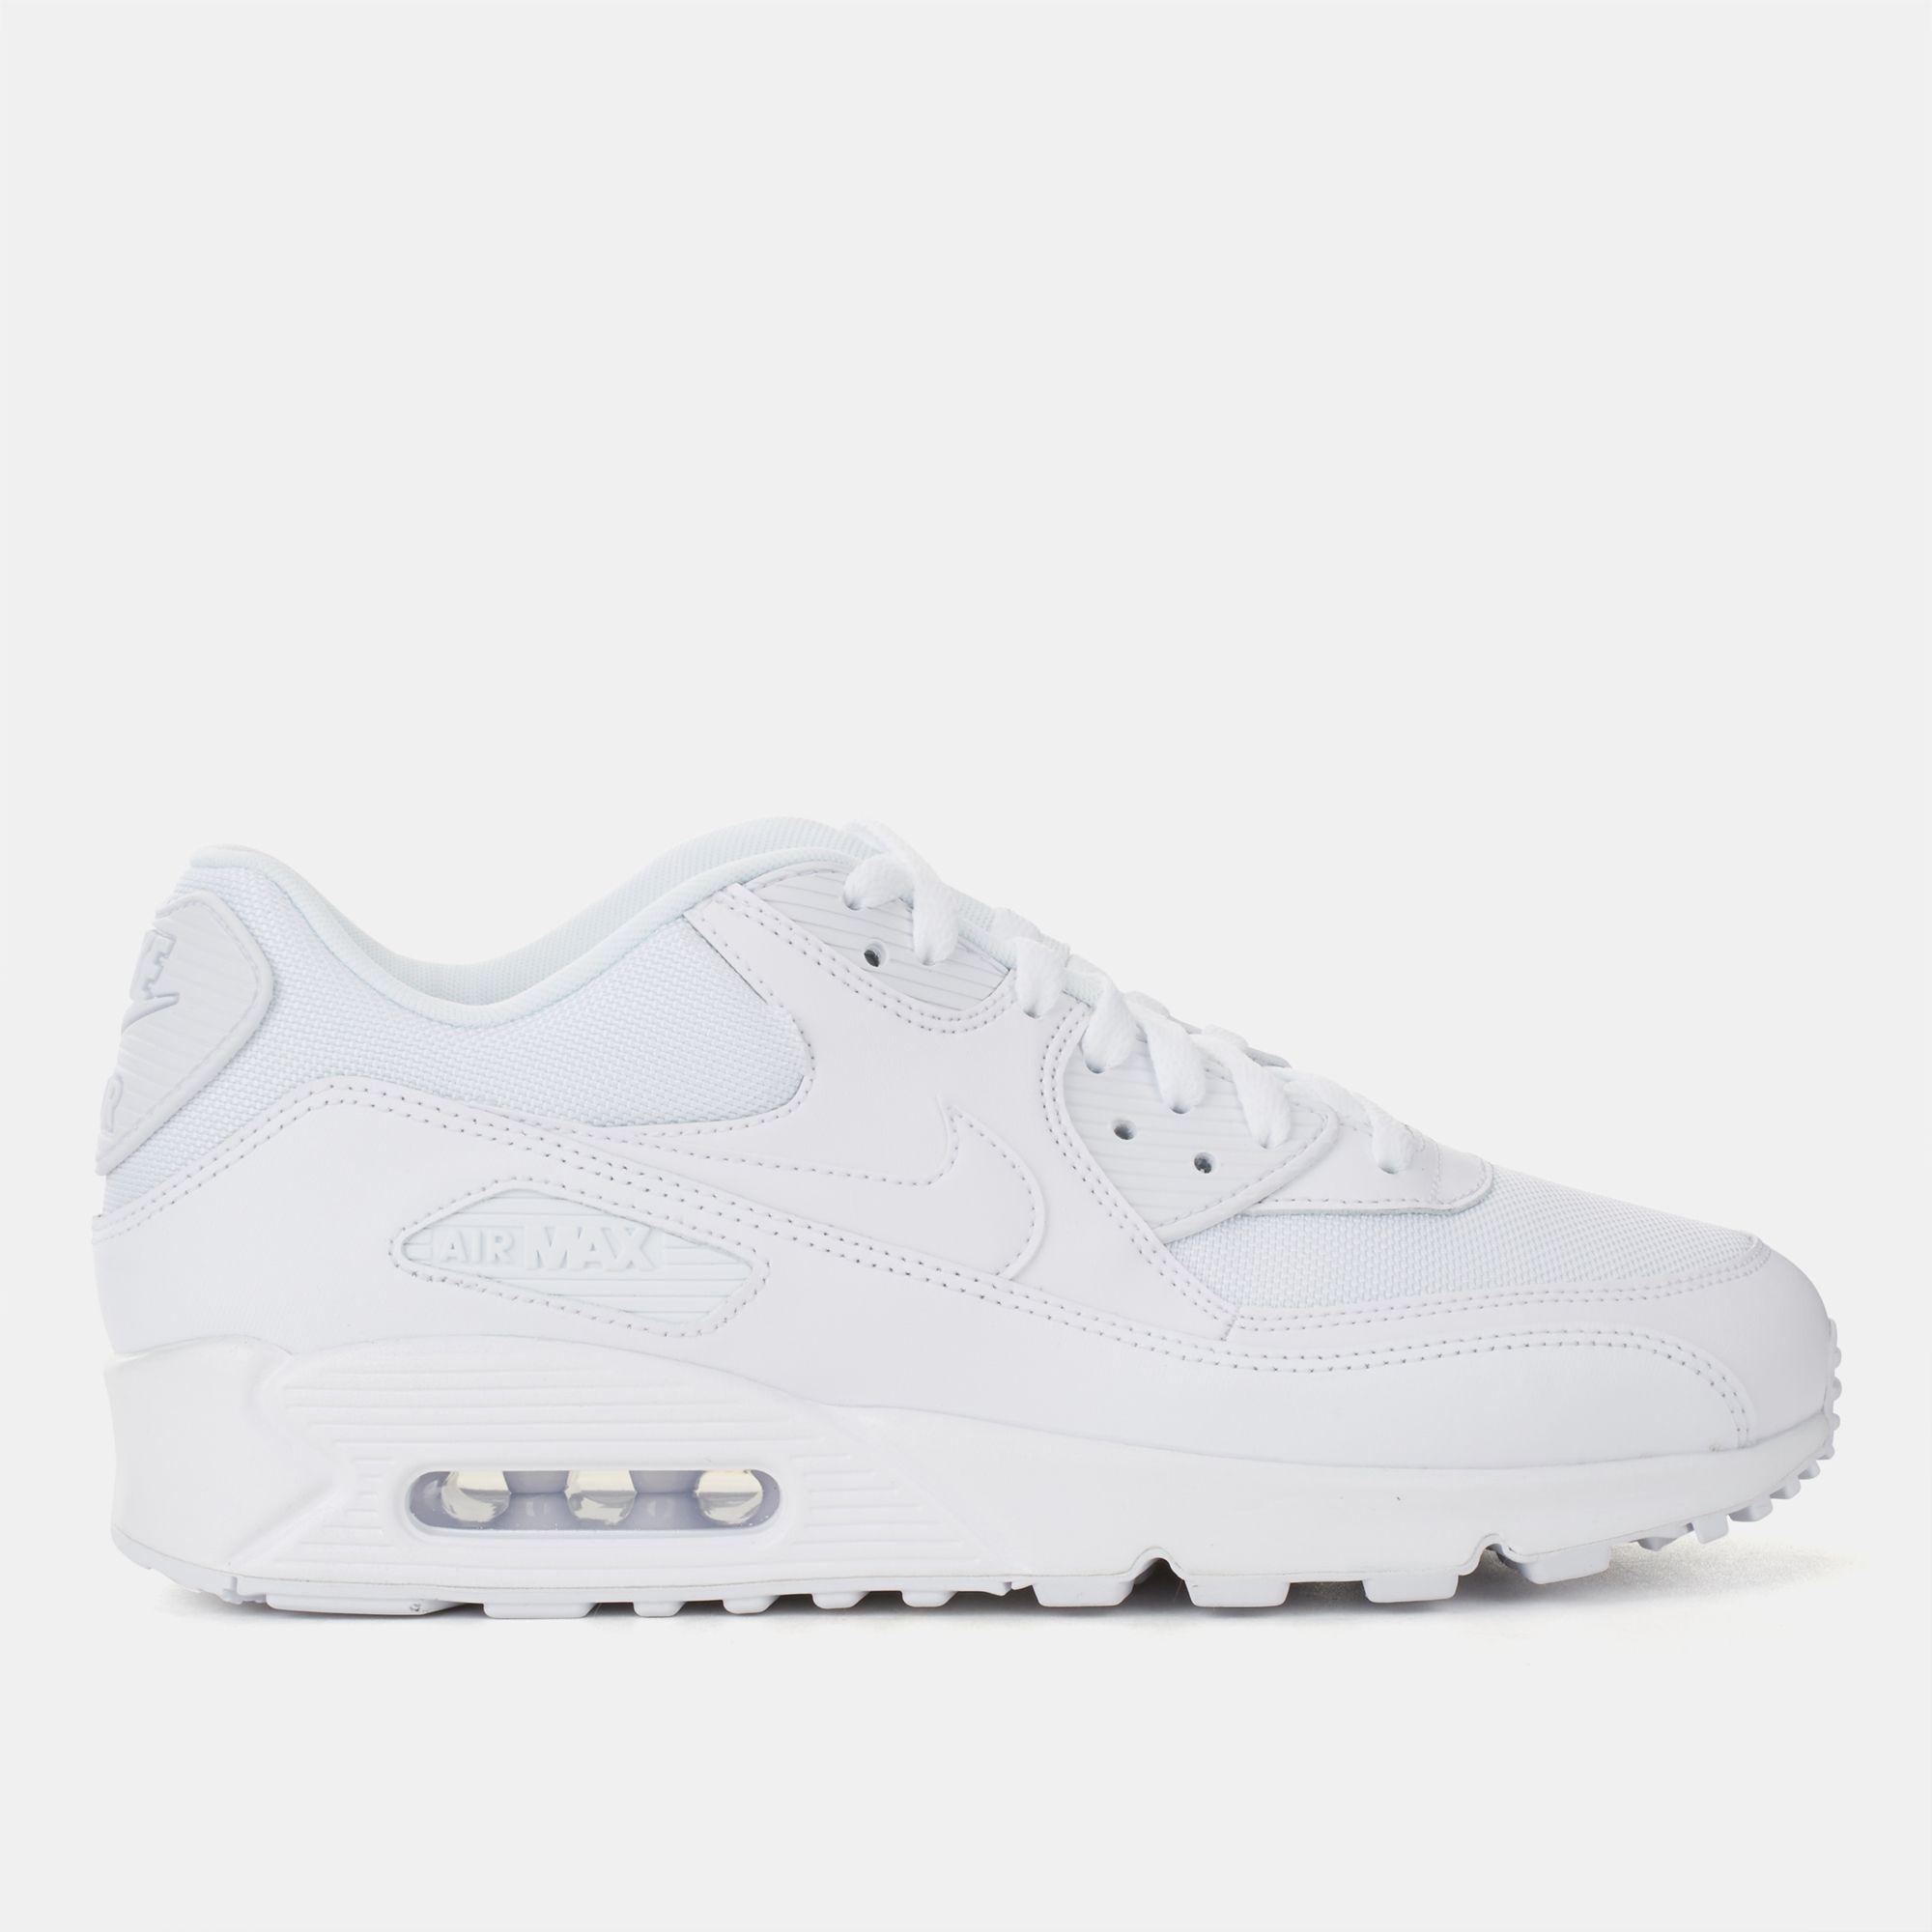 buy online 5dda2 8693d ... order nike air max 90 ultra essential shoe 6c9e0 a2877